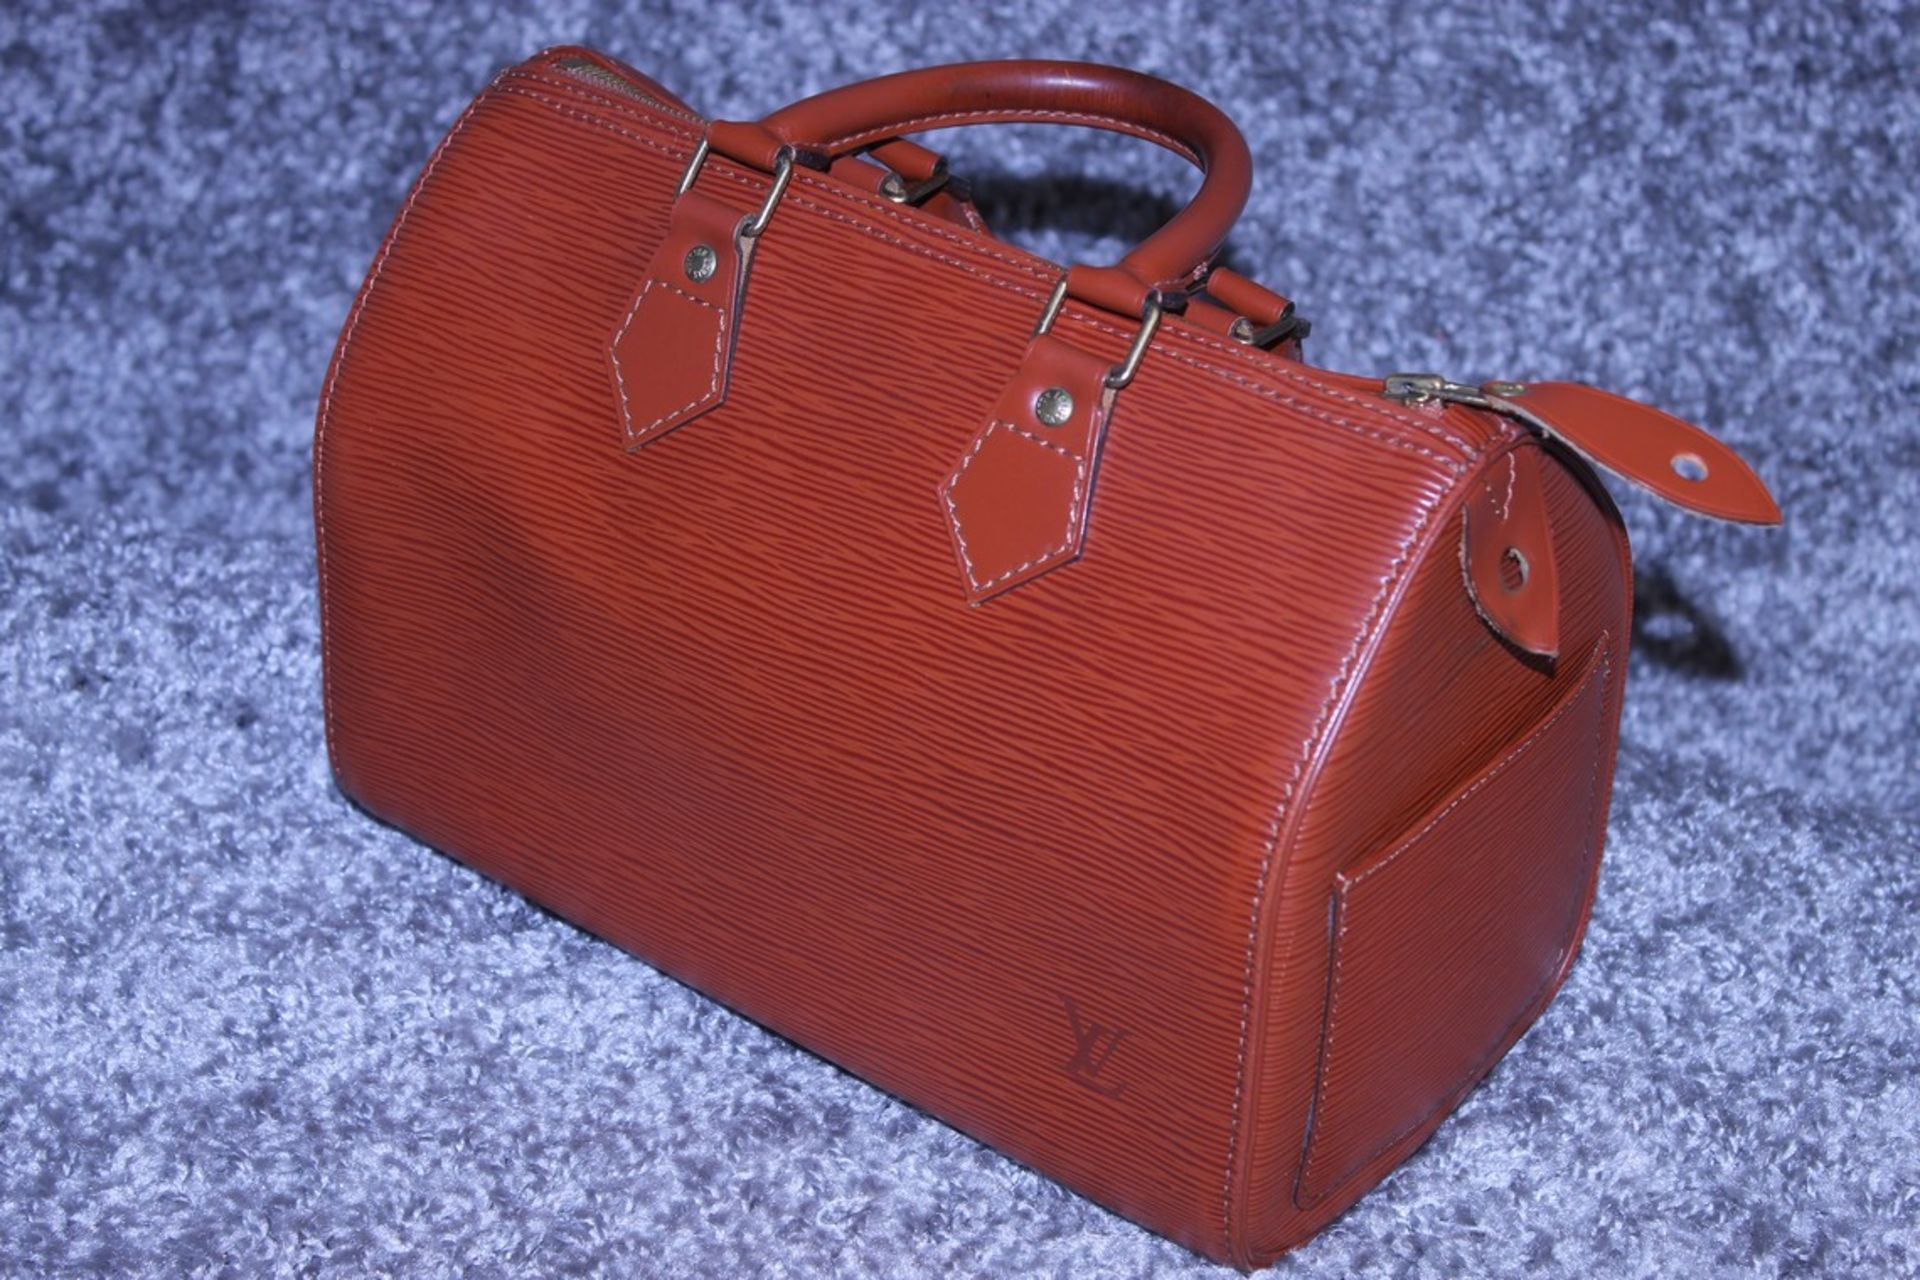 RRP £1,000 Louis Vuitton Speedy 25 Handbag, Tan Epi Calf Leather 27X19X15Cm (Production Code Vi1922) - Image 3 of 3